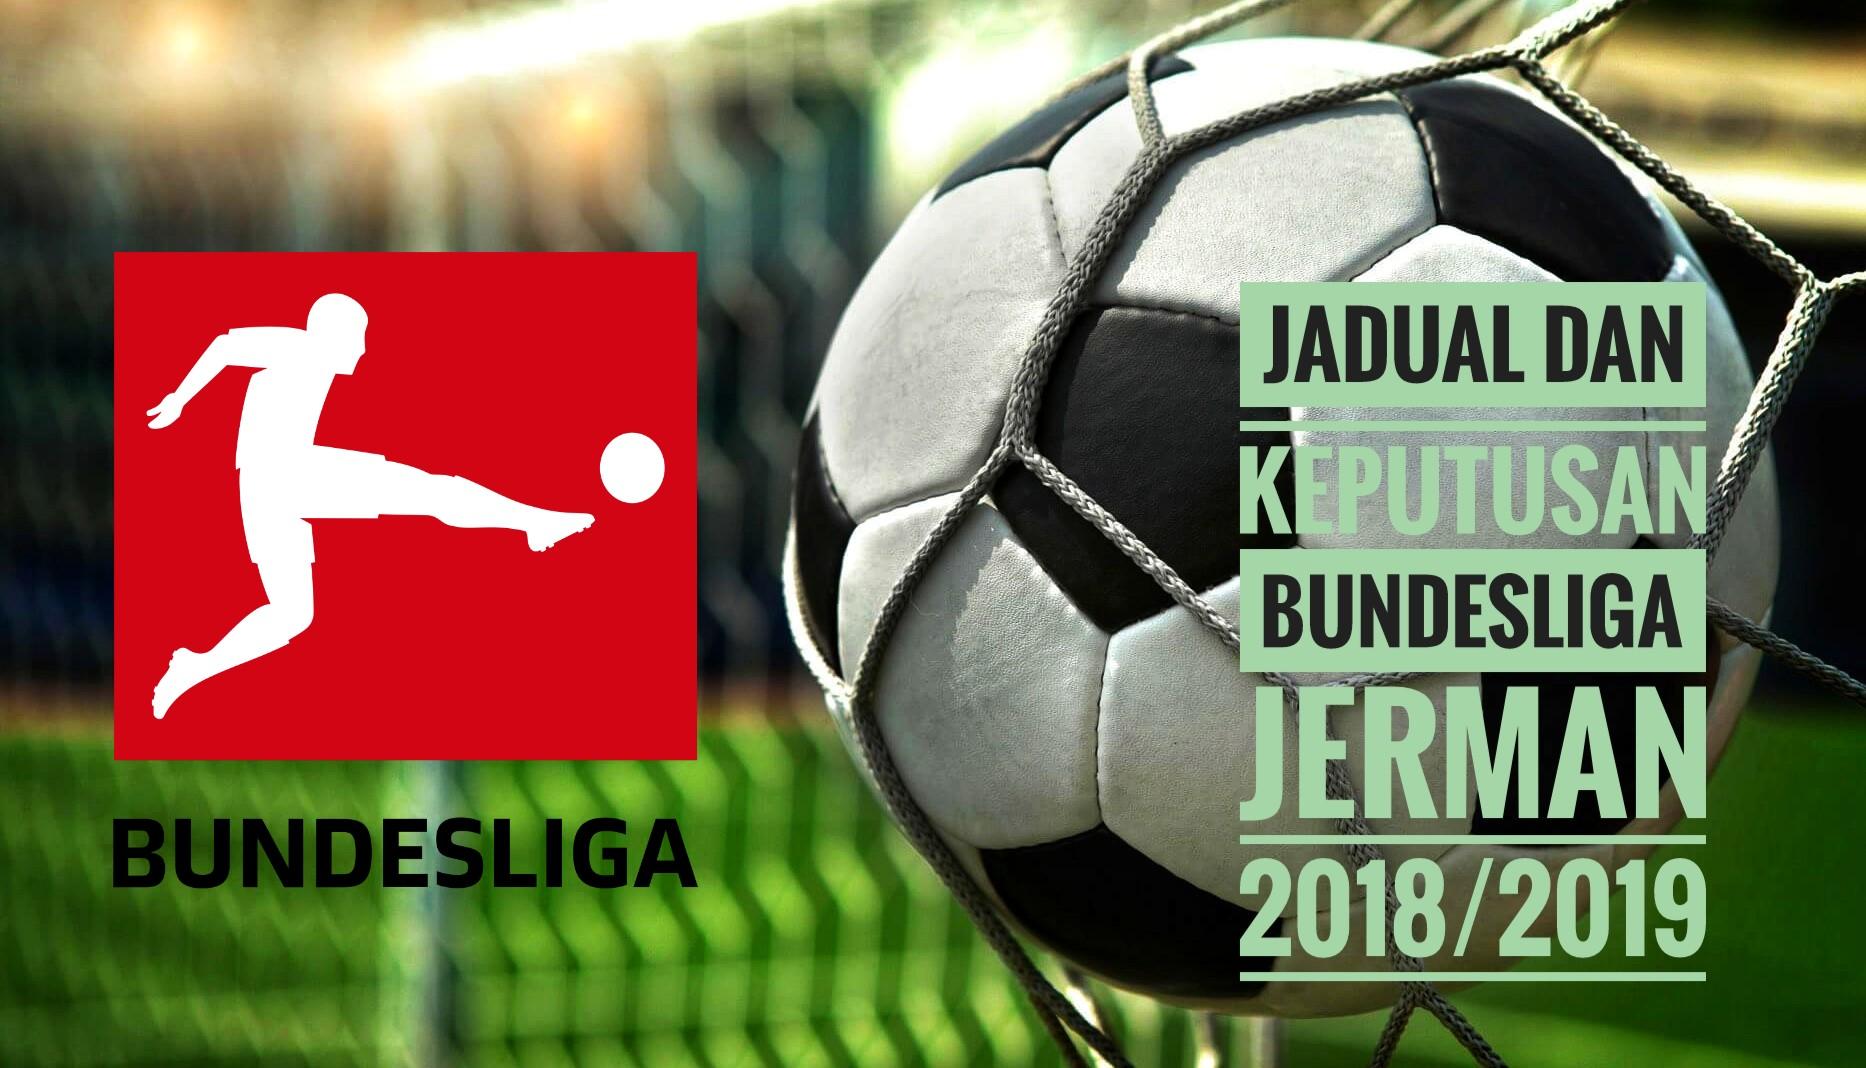 Jadual dan Keputusan Bundesliga Jerman 2018/2019